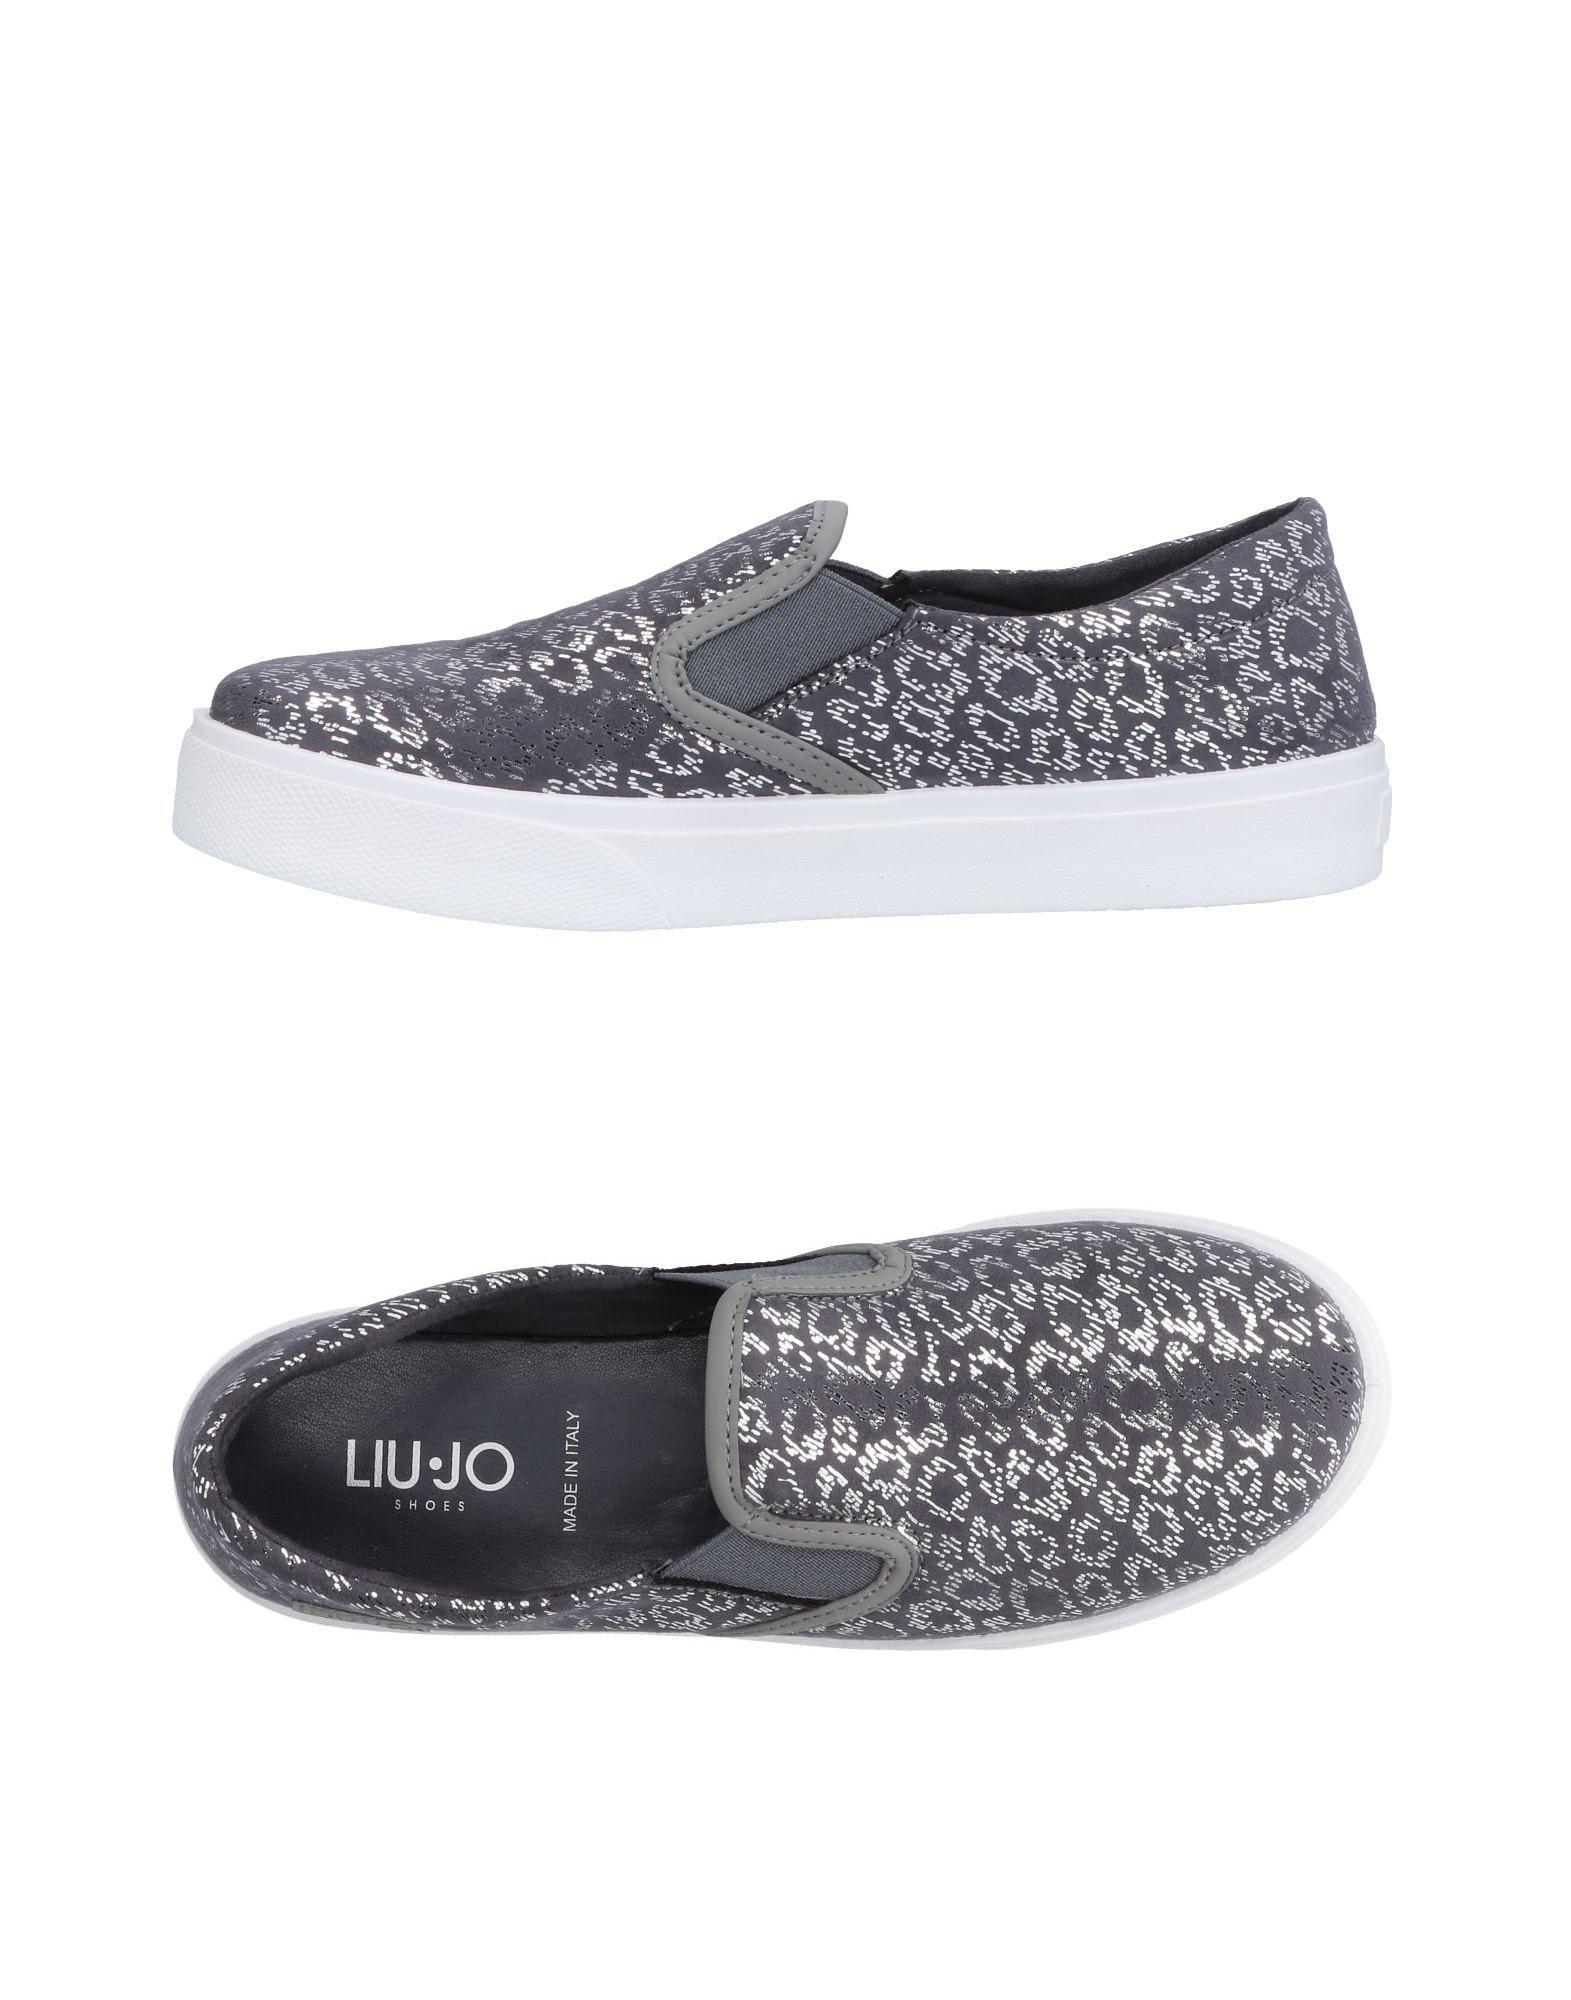 Liu •Jo Shoes Sneakers Damen  11487215XX Gute Qualität beliebte Schuhe